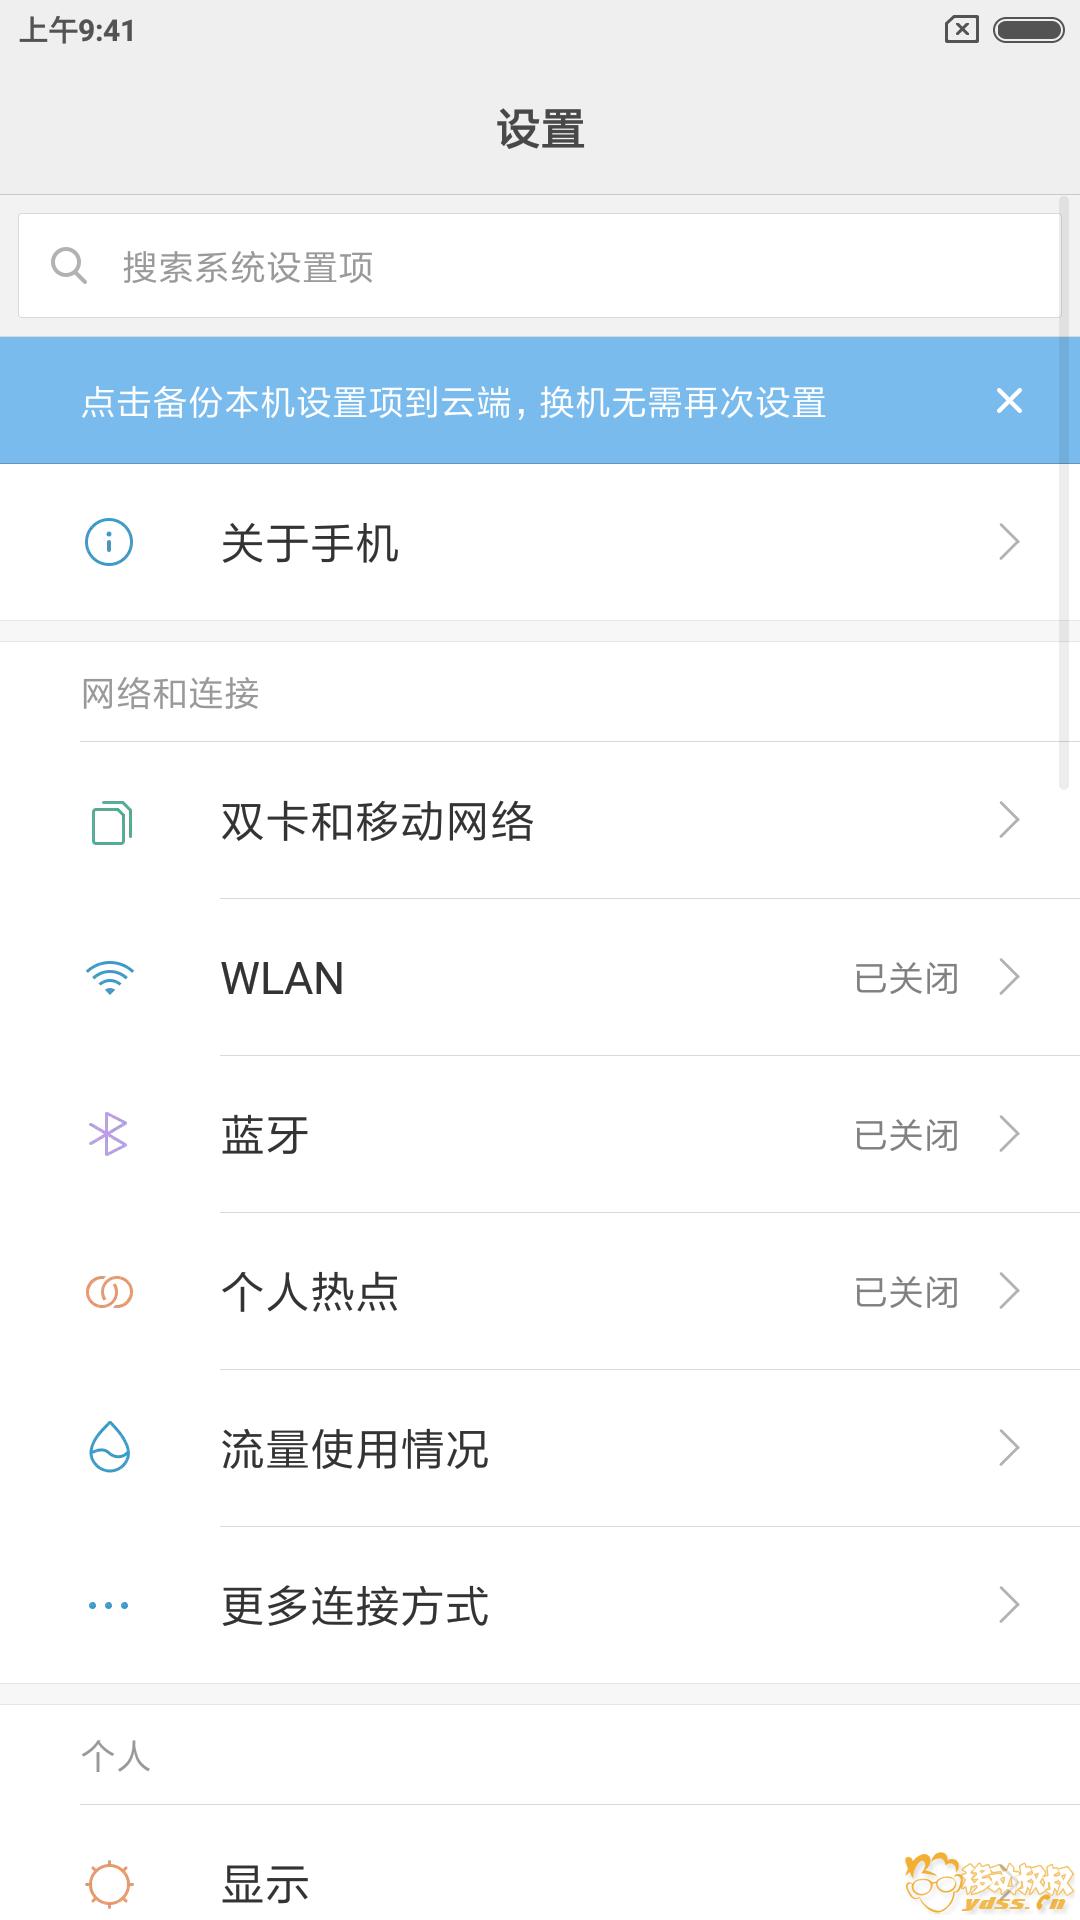 Screenshot_2018-05-06-09-41-59-309_com.android.settings.png